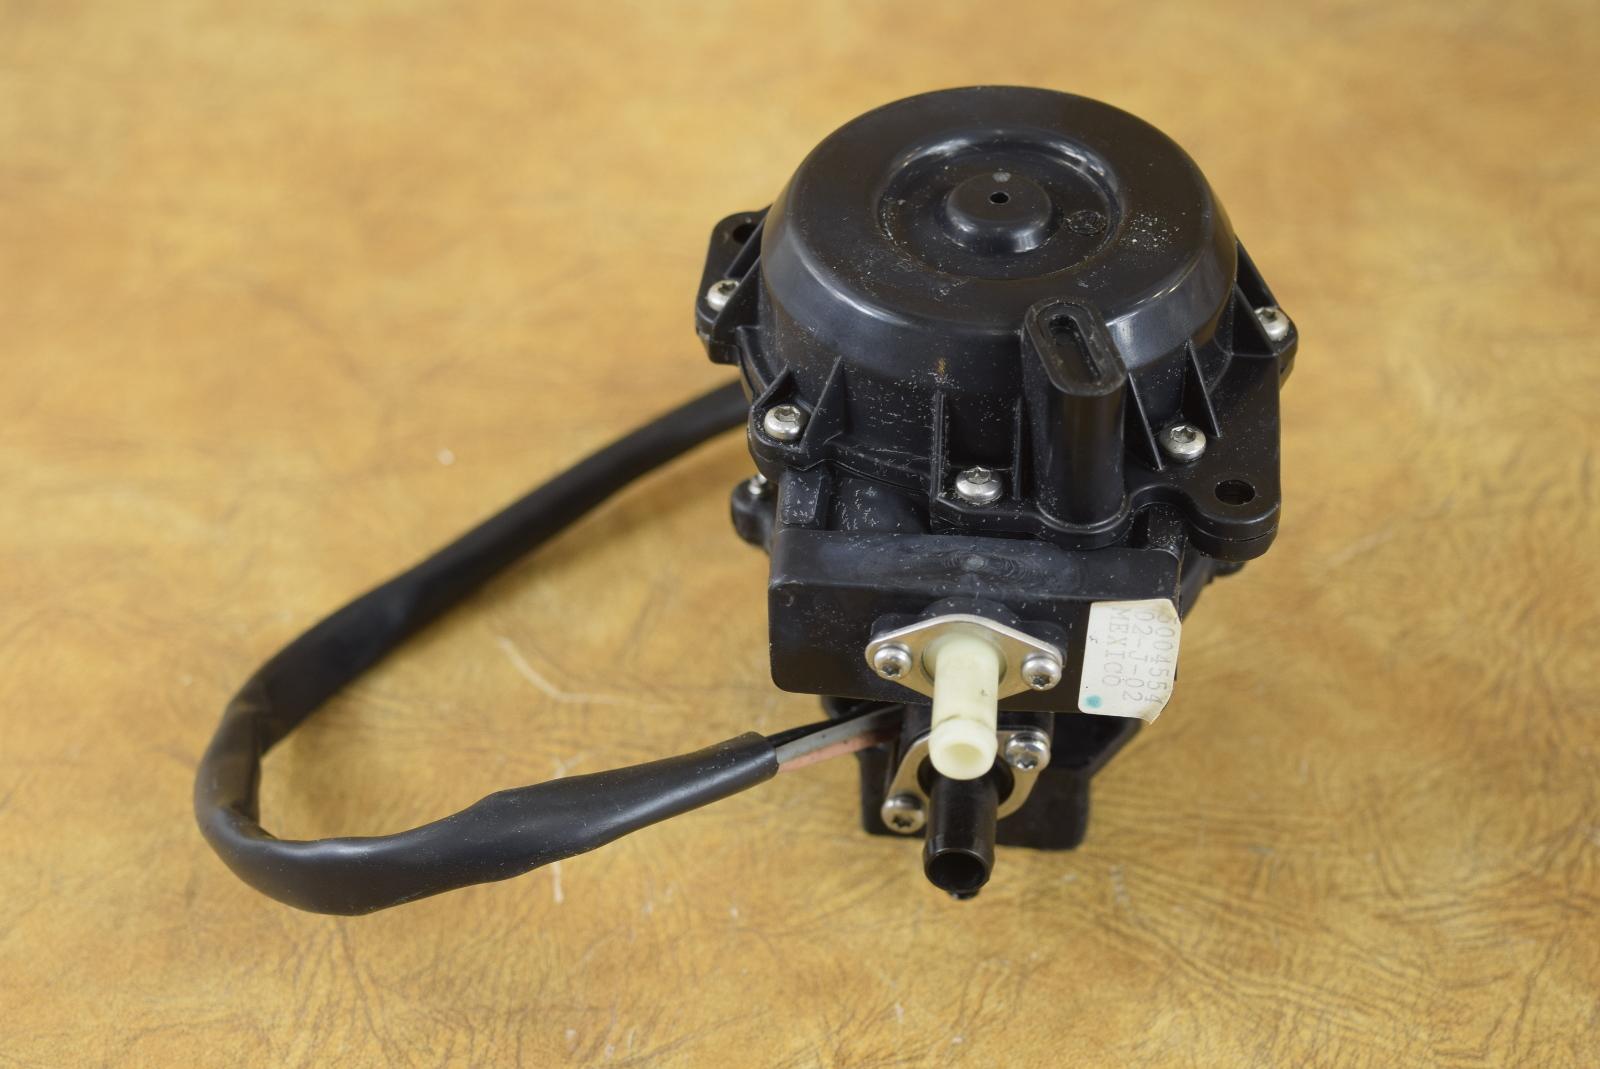 1 year warranty 1990 06 johnson evinrude 4 wire vro pump w torx rh southcentraloutboards com VRO Fuel Pump johnson vro pump wiring